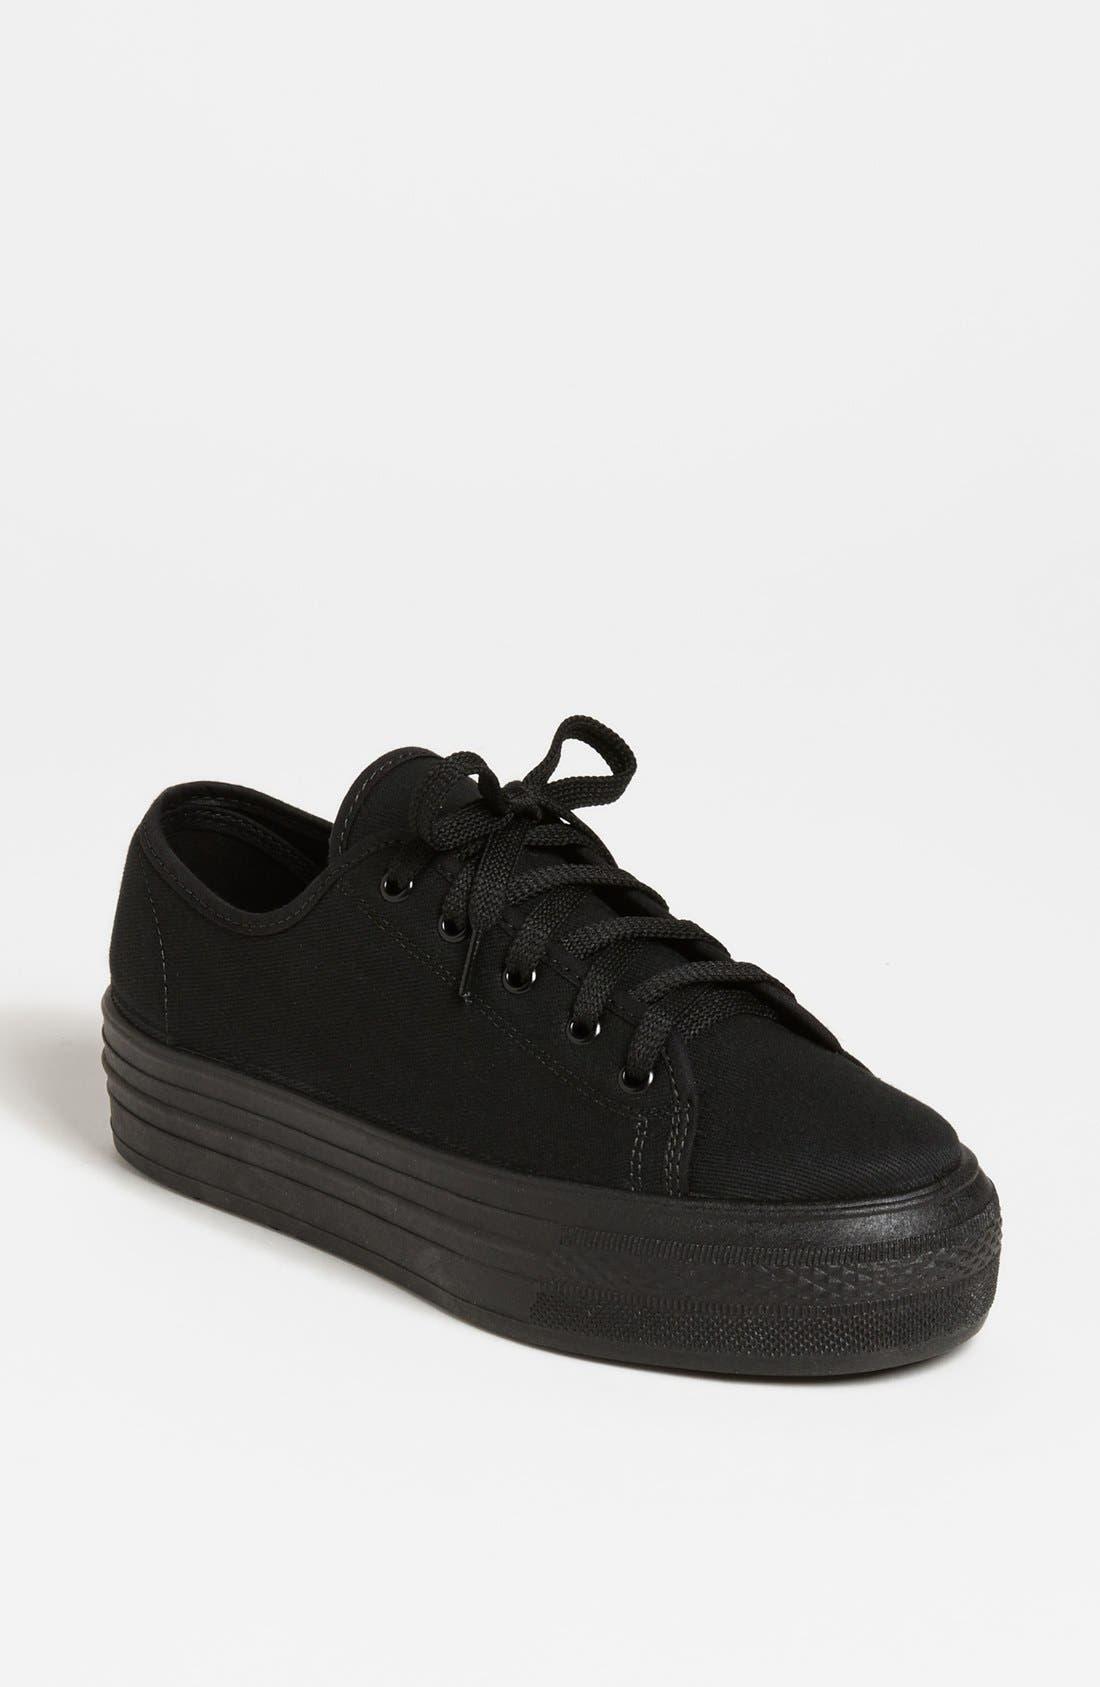 Main Image - Topshop 'Heavy' Sneaker